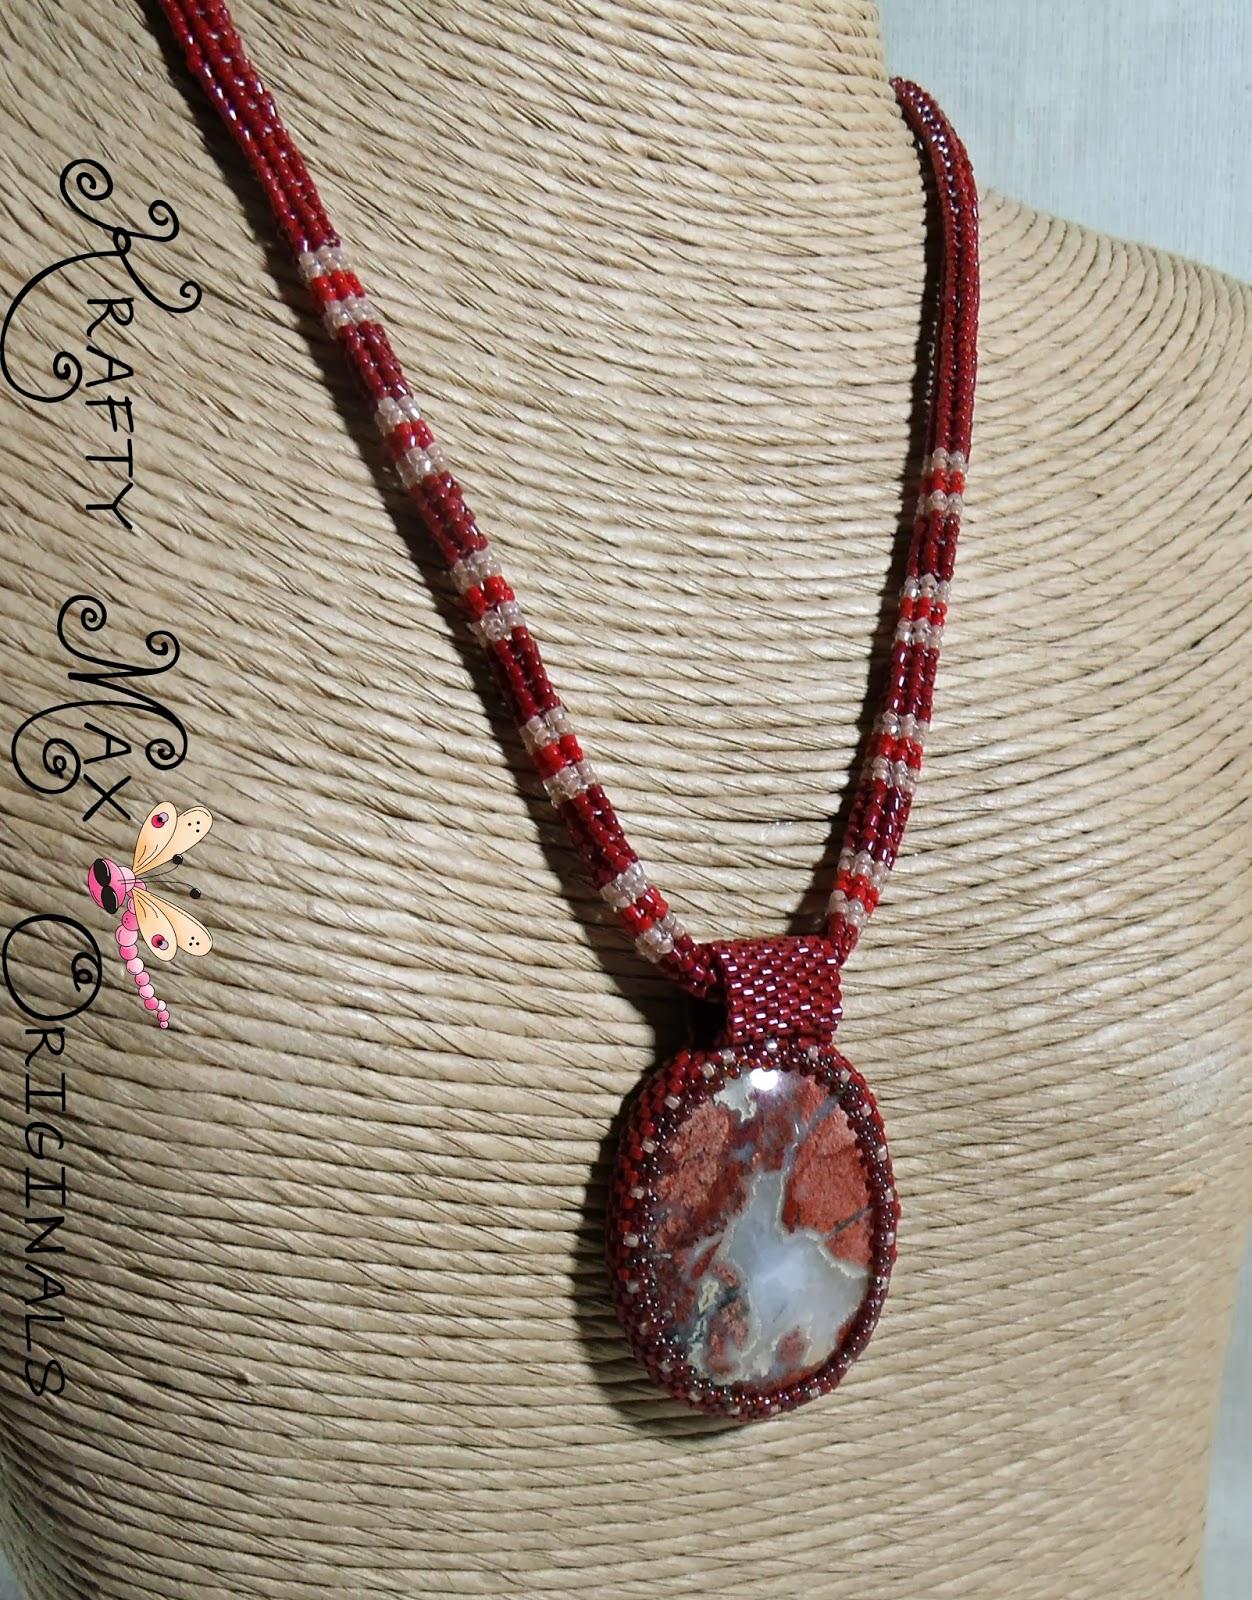 http://www.lajuliet.com/index.php/2013-01-04-15-21-51/ad/beadwork,46/red-velvet-and-cream-handmade-beadwoven-necklace-set-a-krafty-max-original-design,226